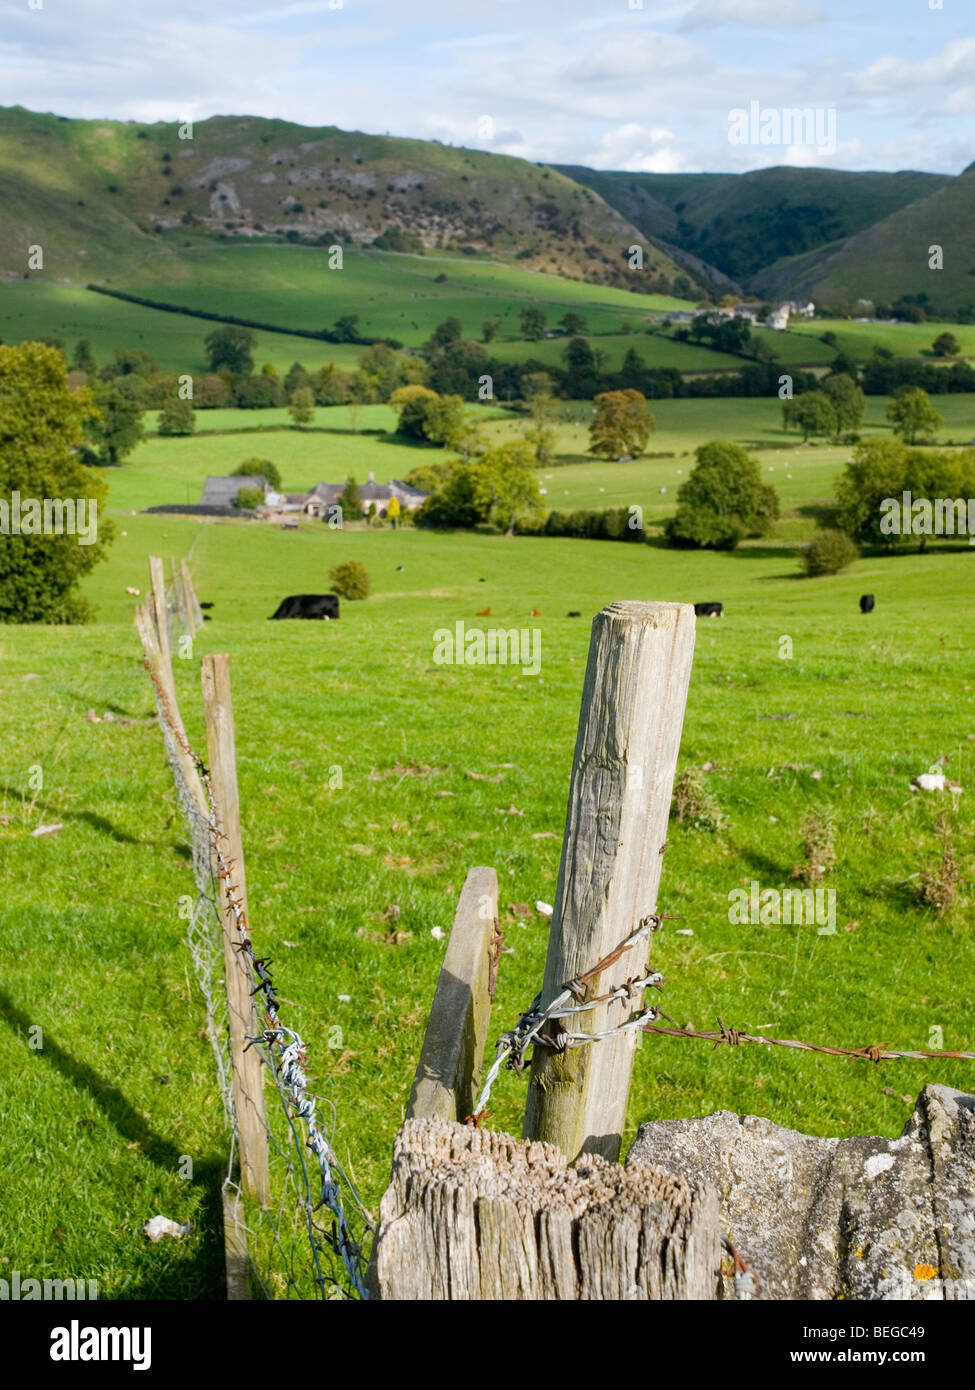 Rural countryside surrounding Ilam Village in Derbyshire England UK - Stock Image